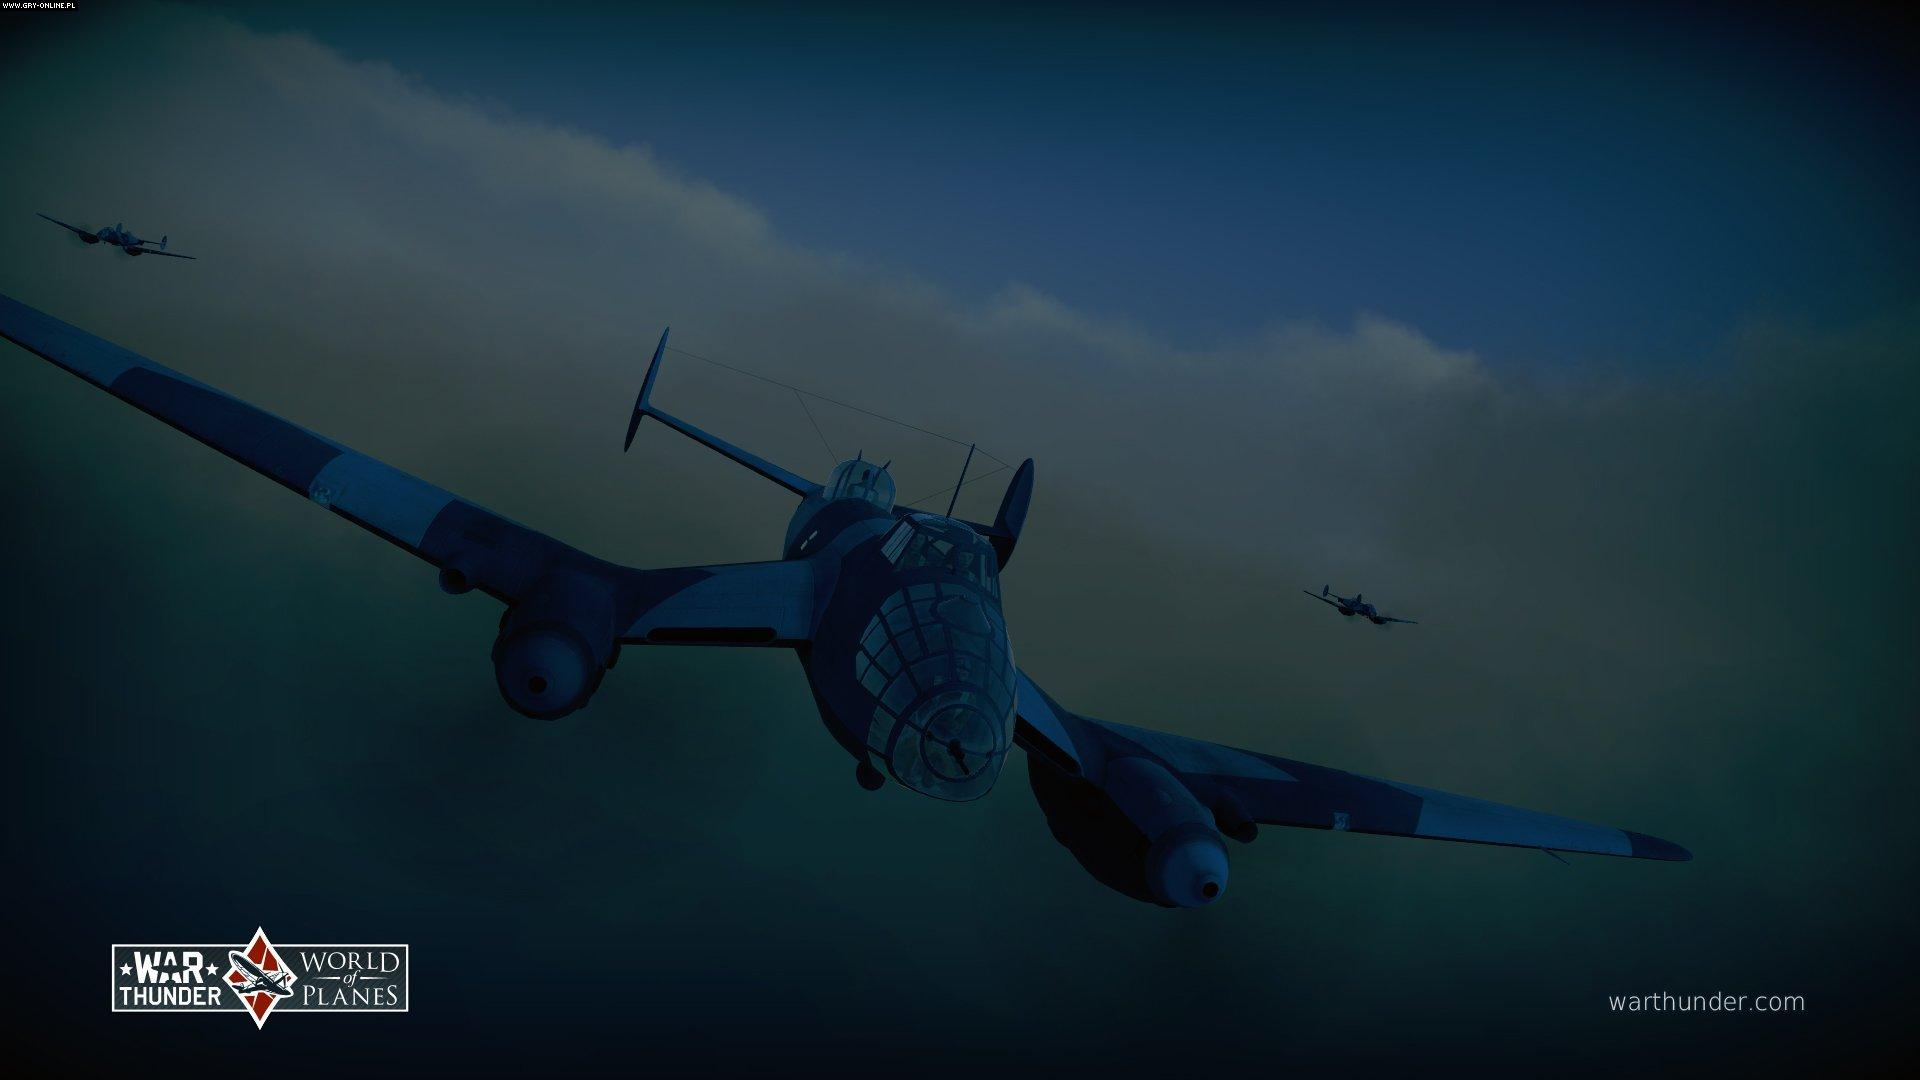 War thunder game virus attack on computer